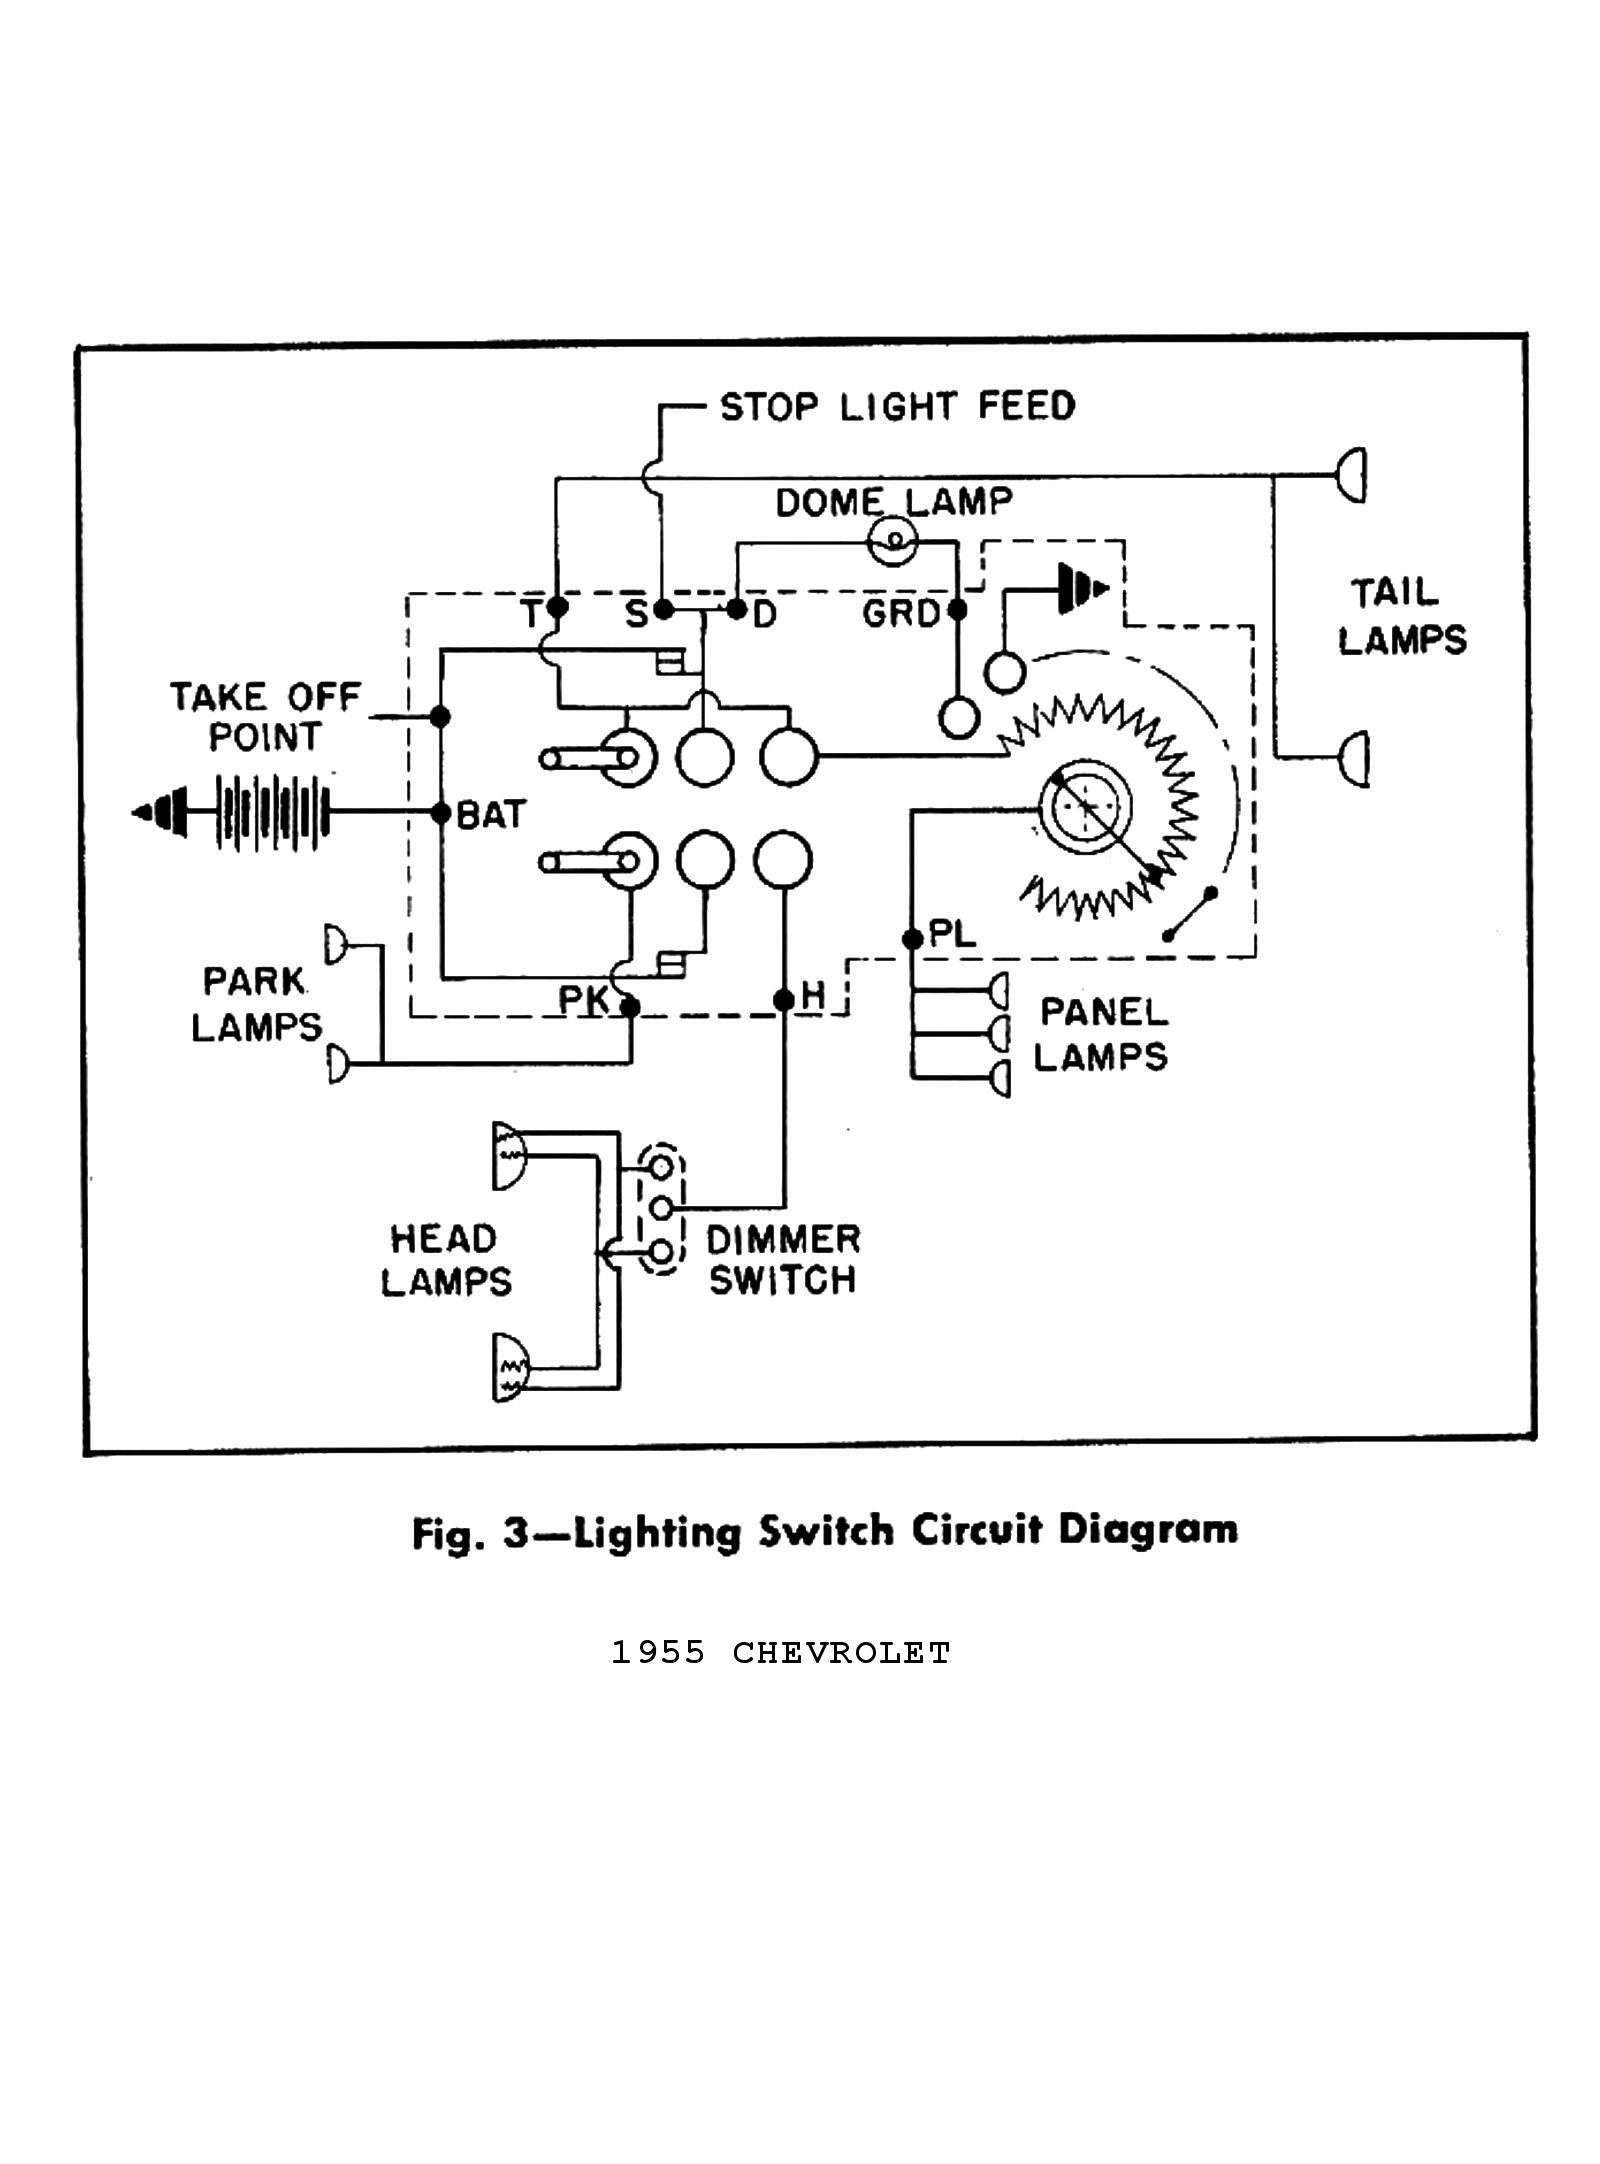 Diagram  Gm Passkey Wiring Diagram Full Version Hd Quality Wiring Diagram